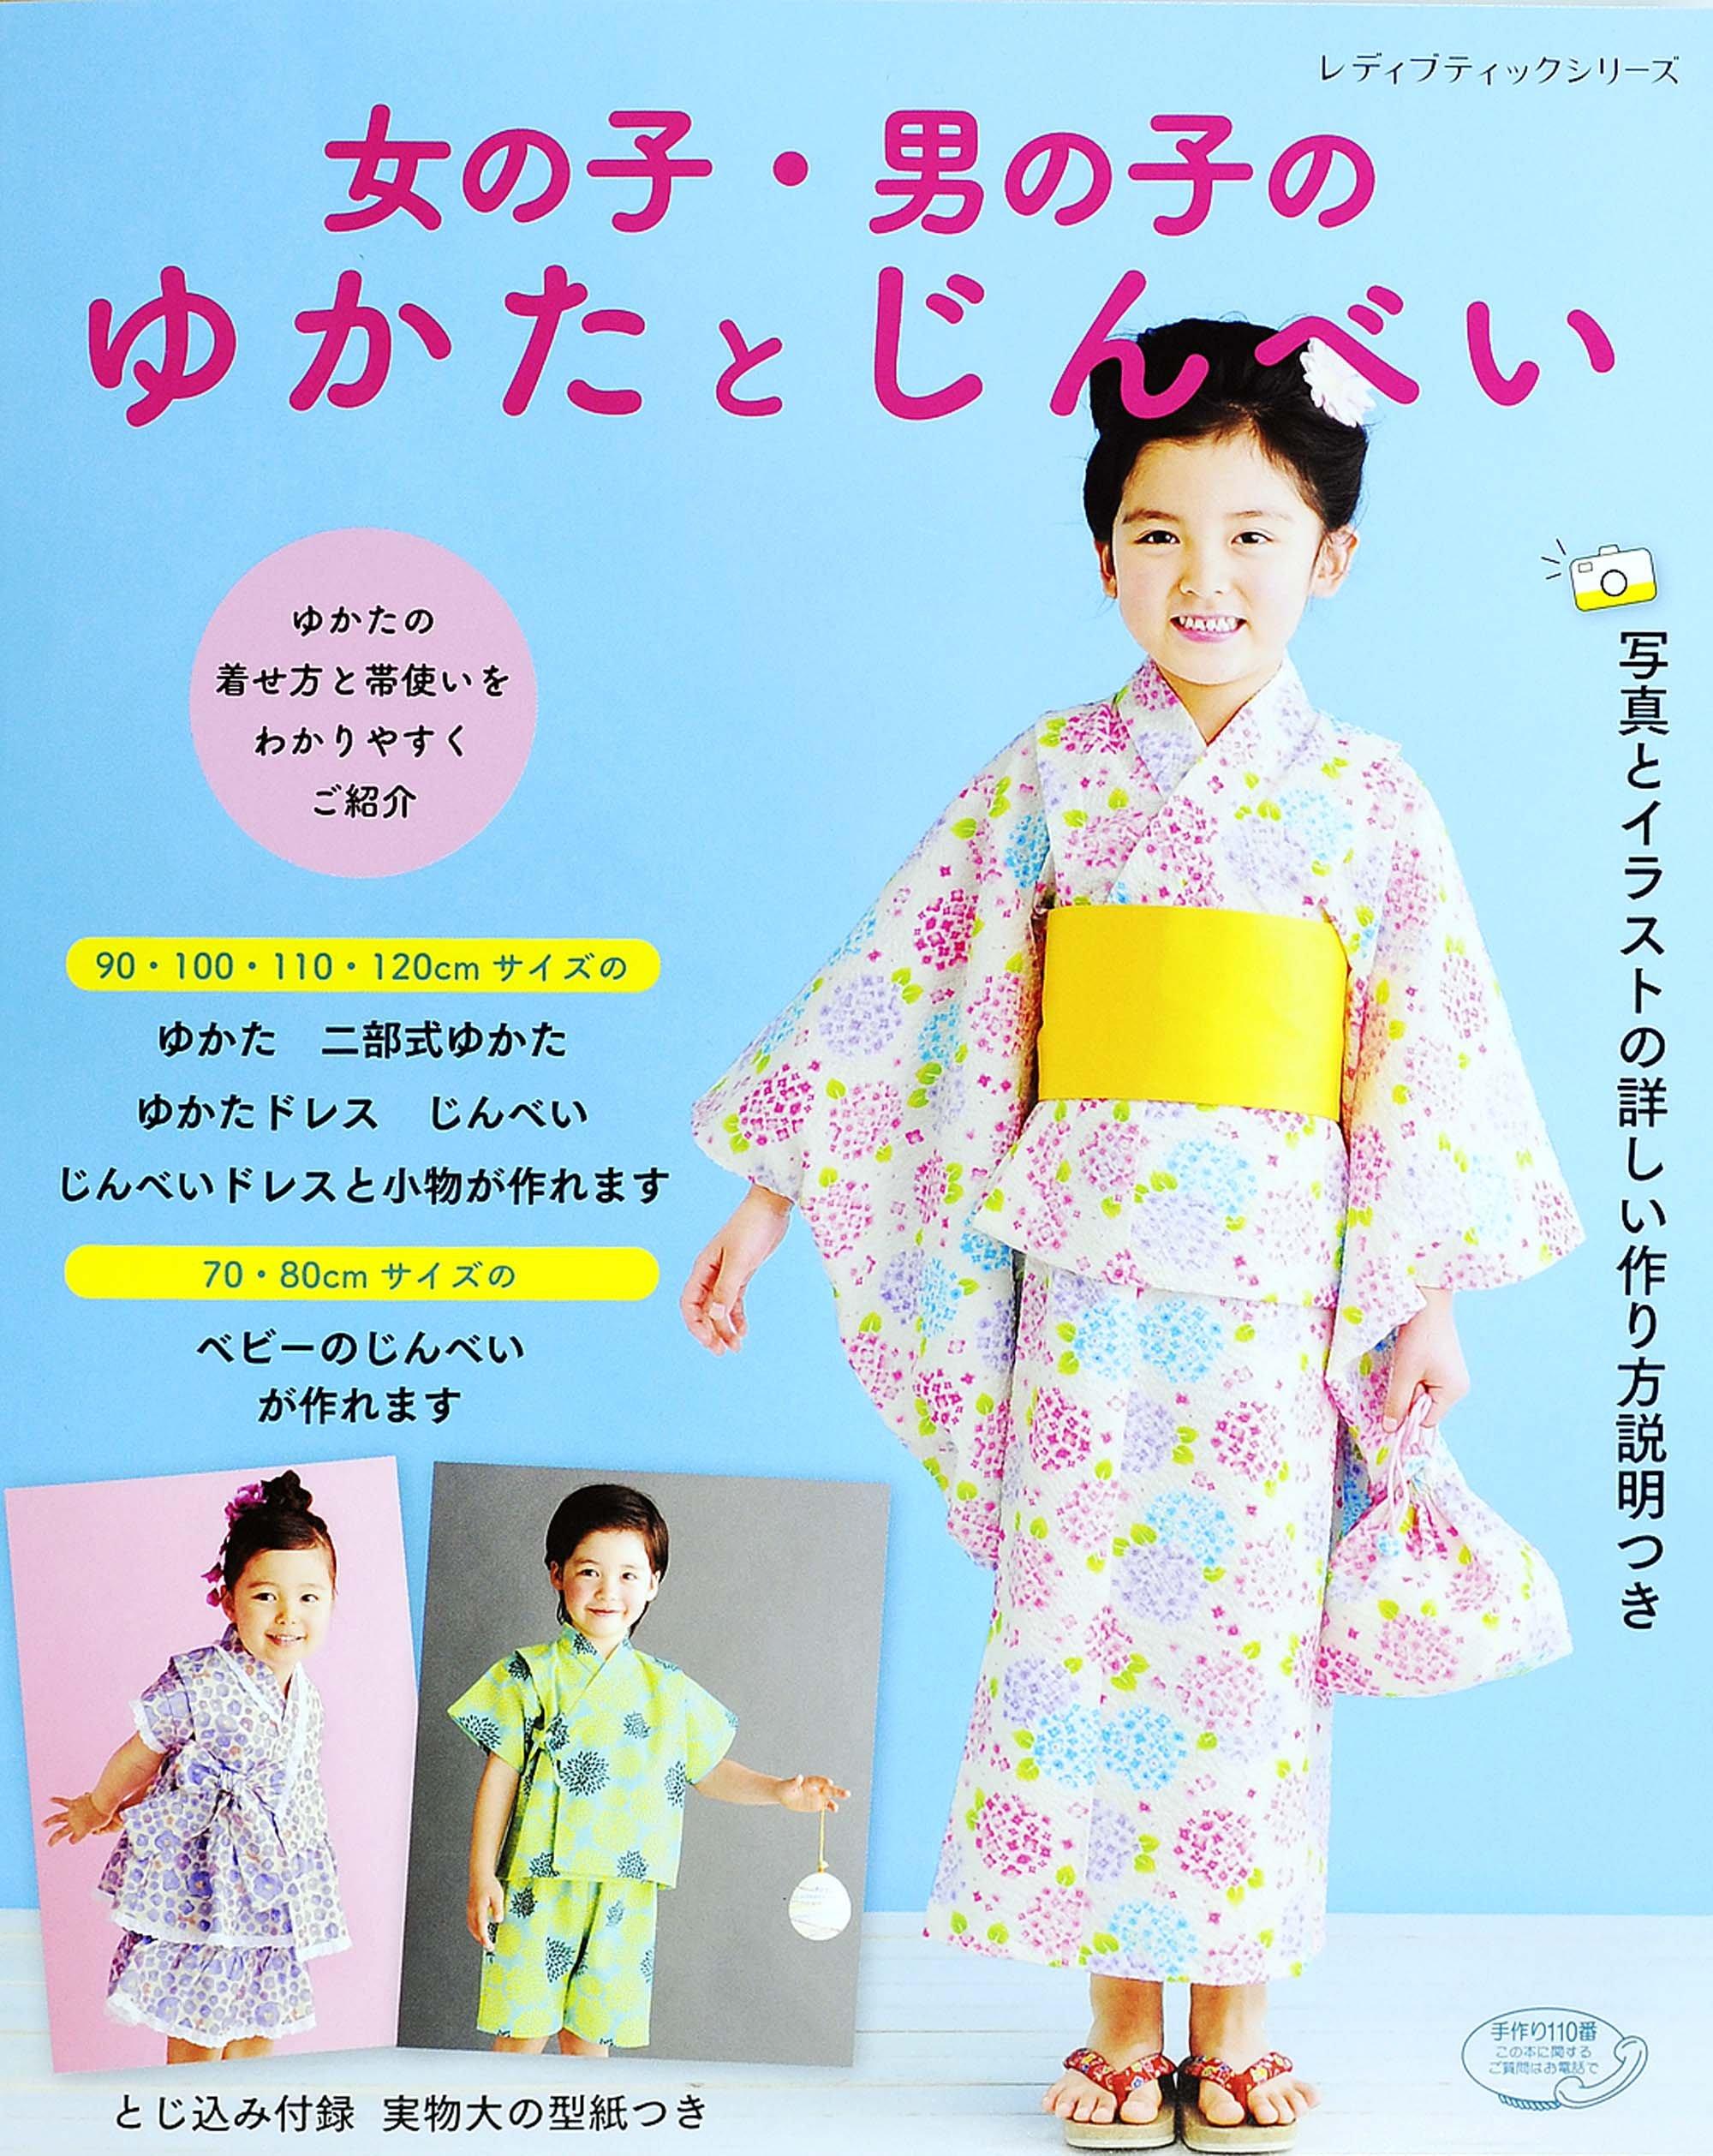 Girl-boy of yukata and Jinbei